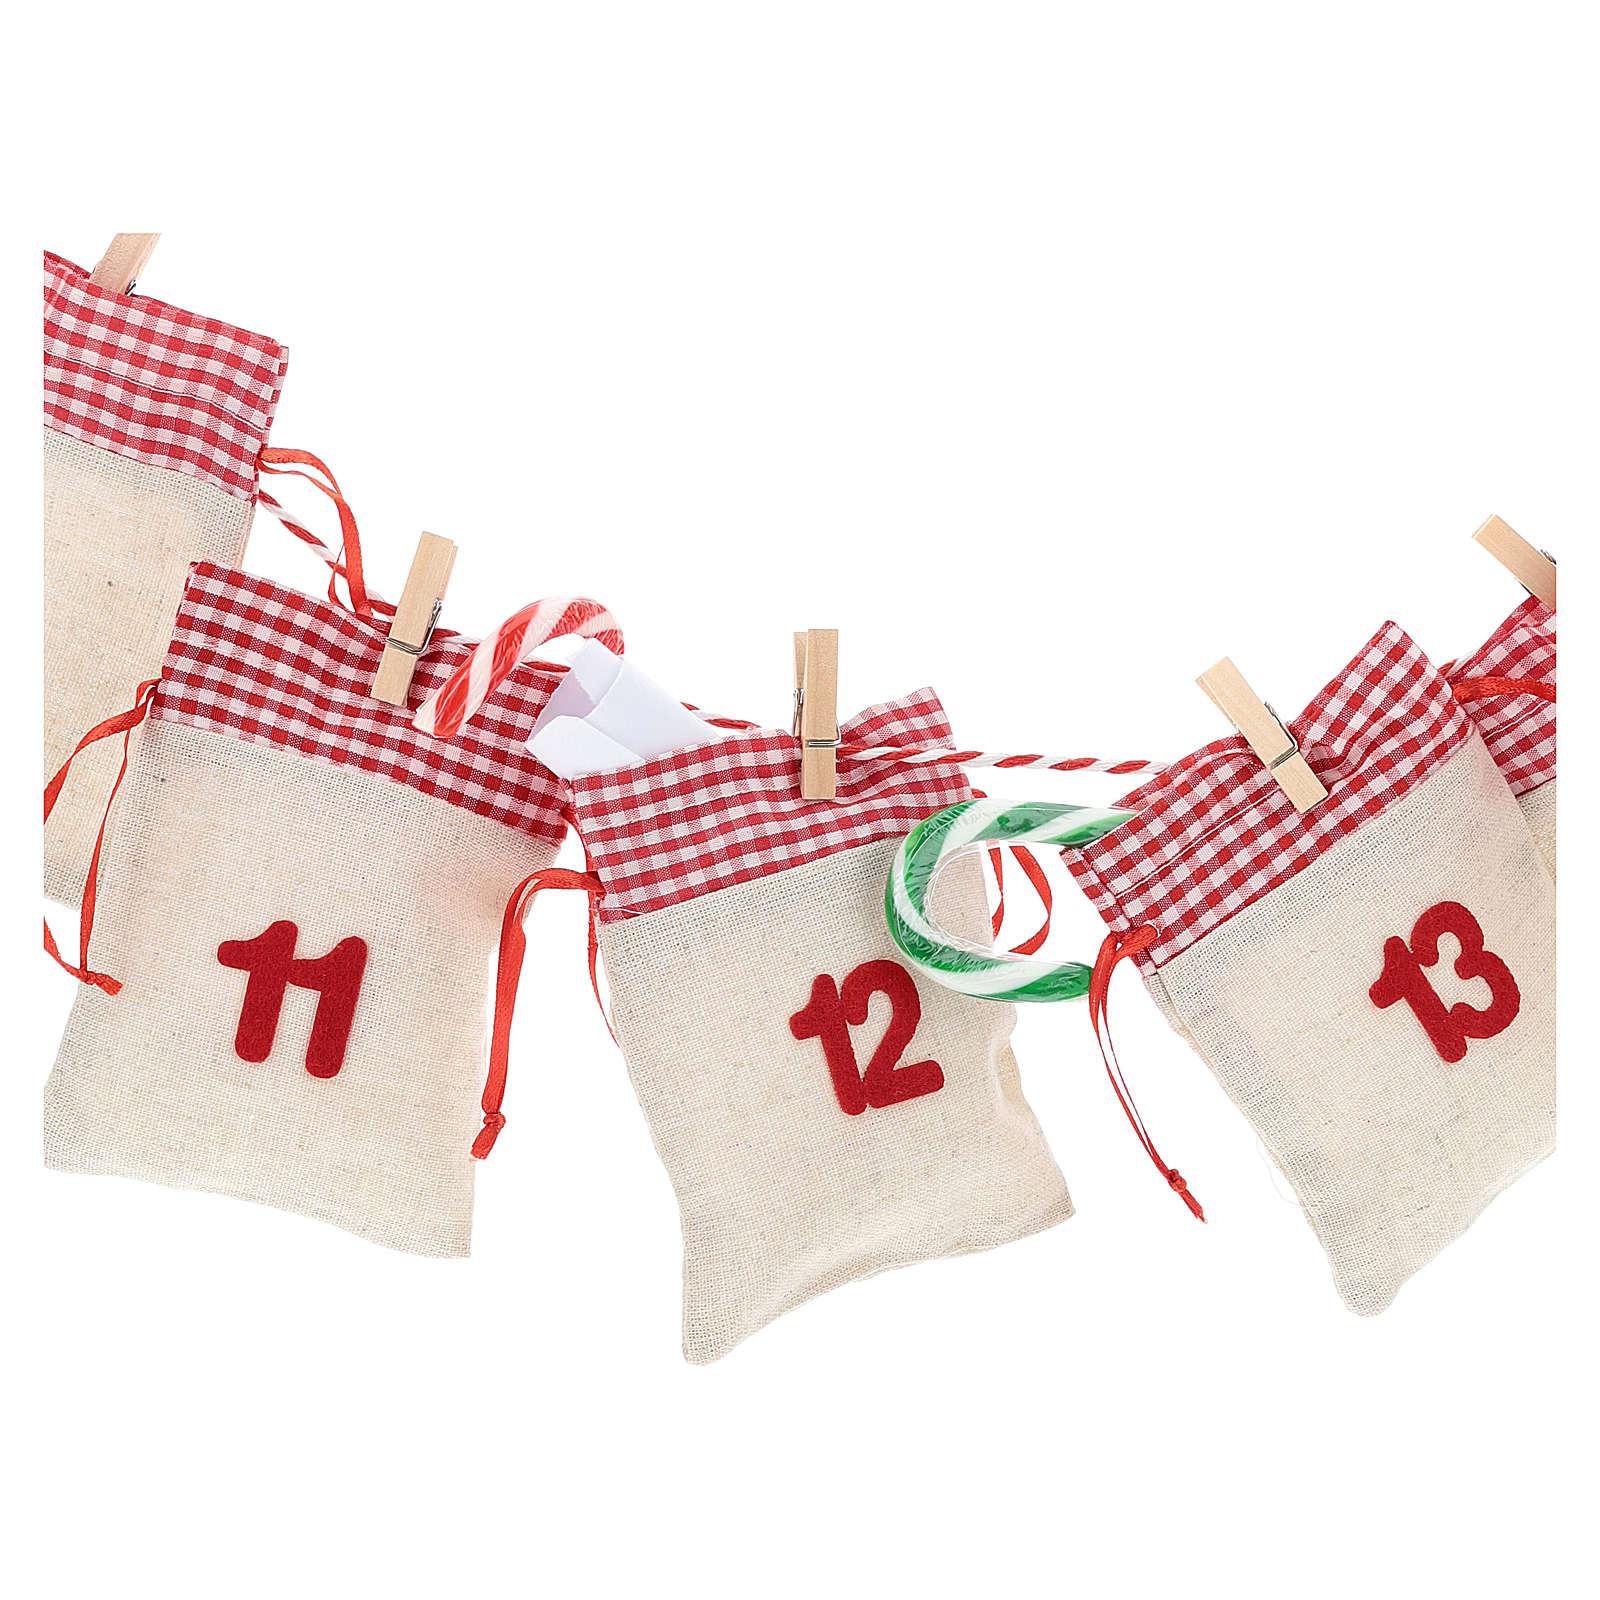 Advent calendar with bags 3